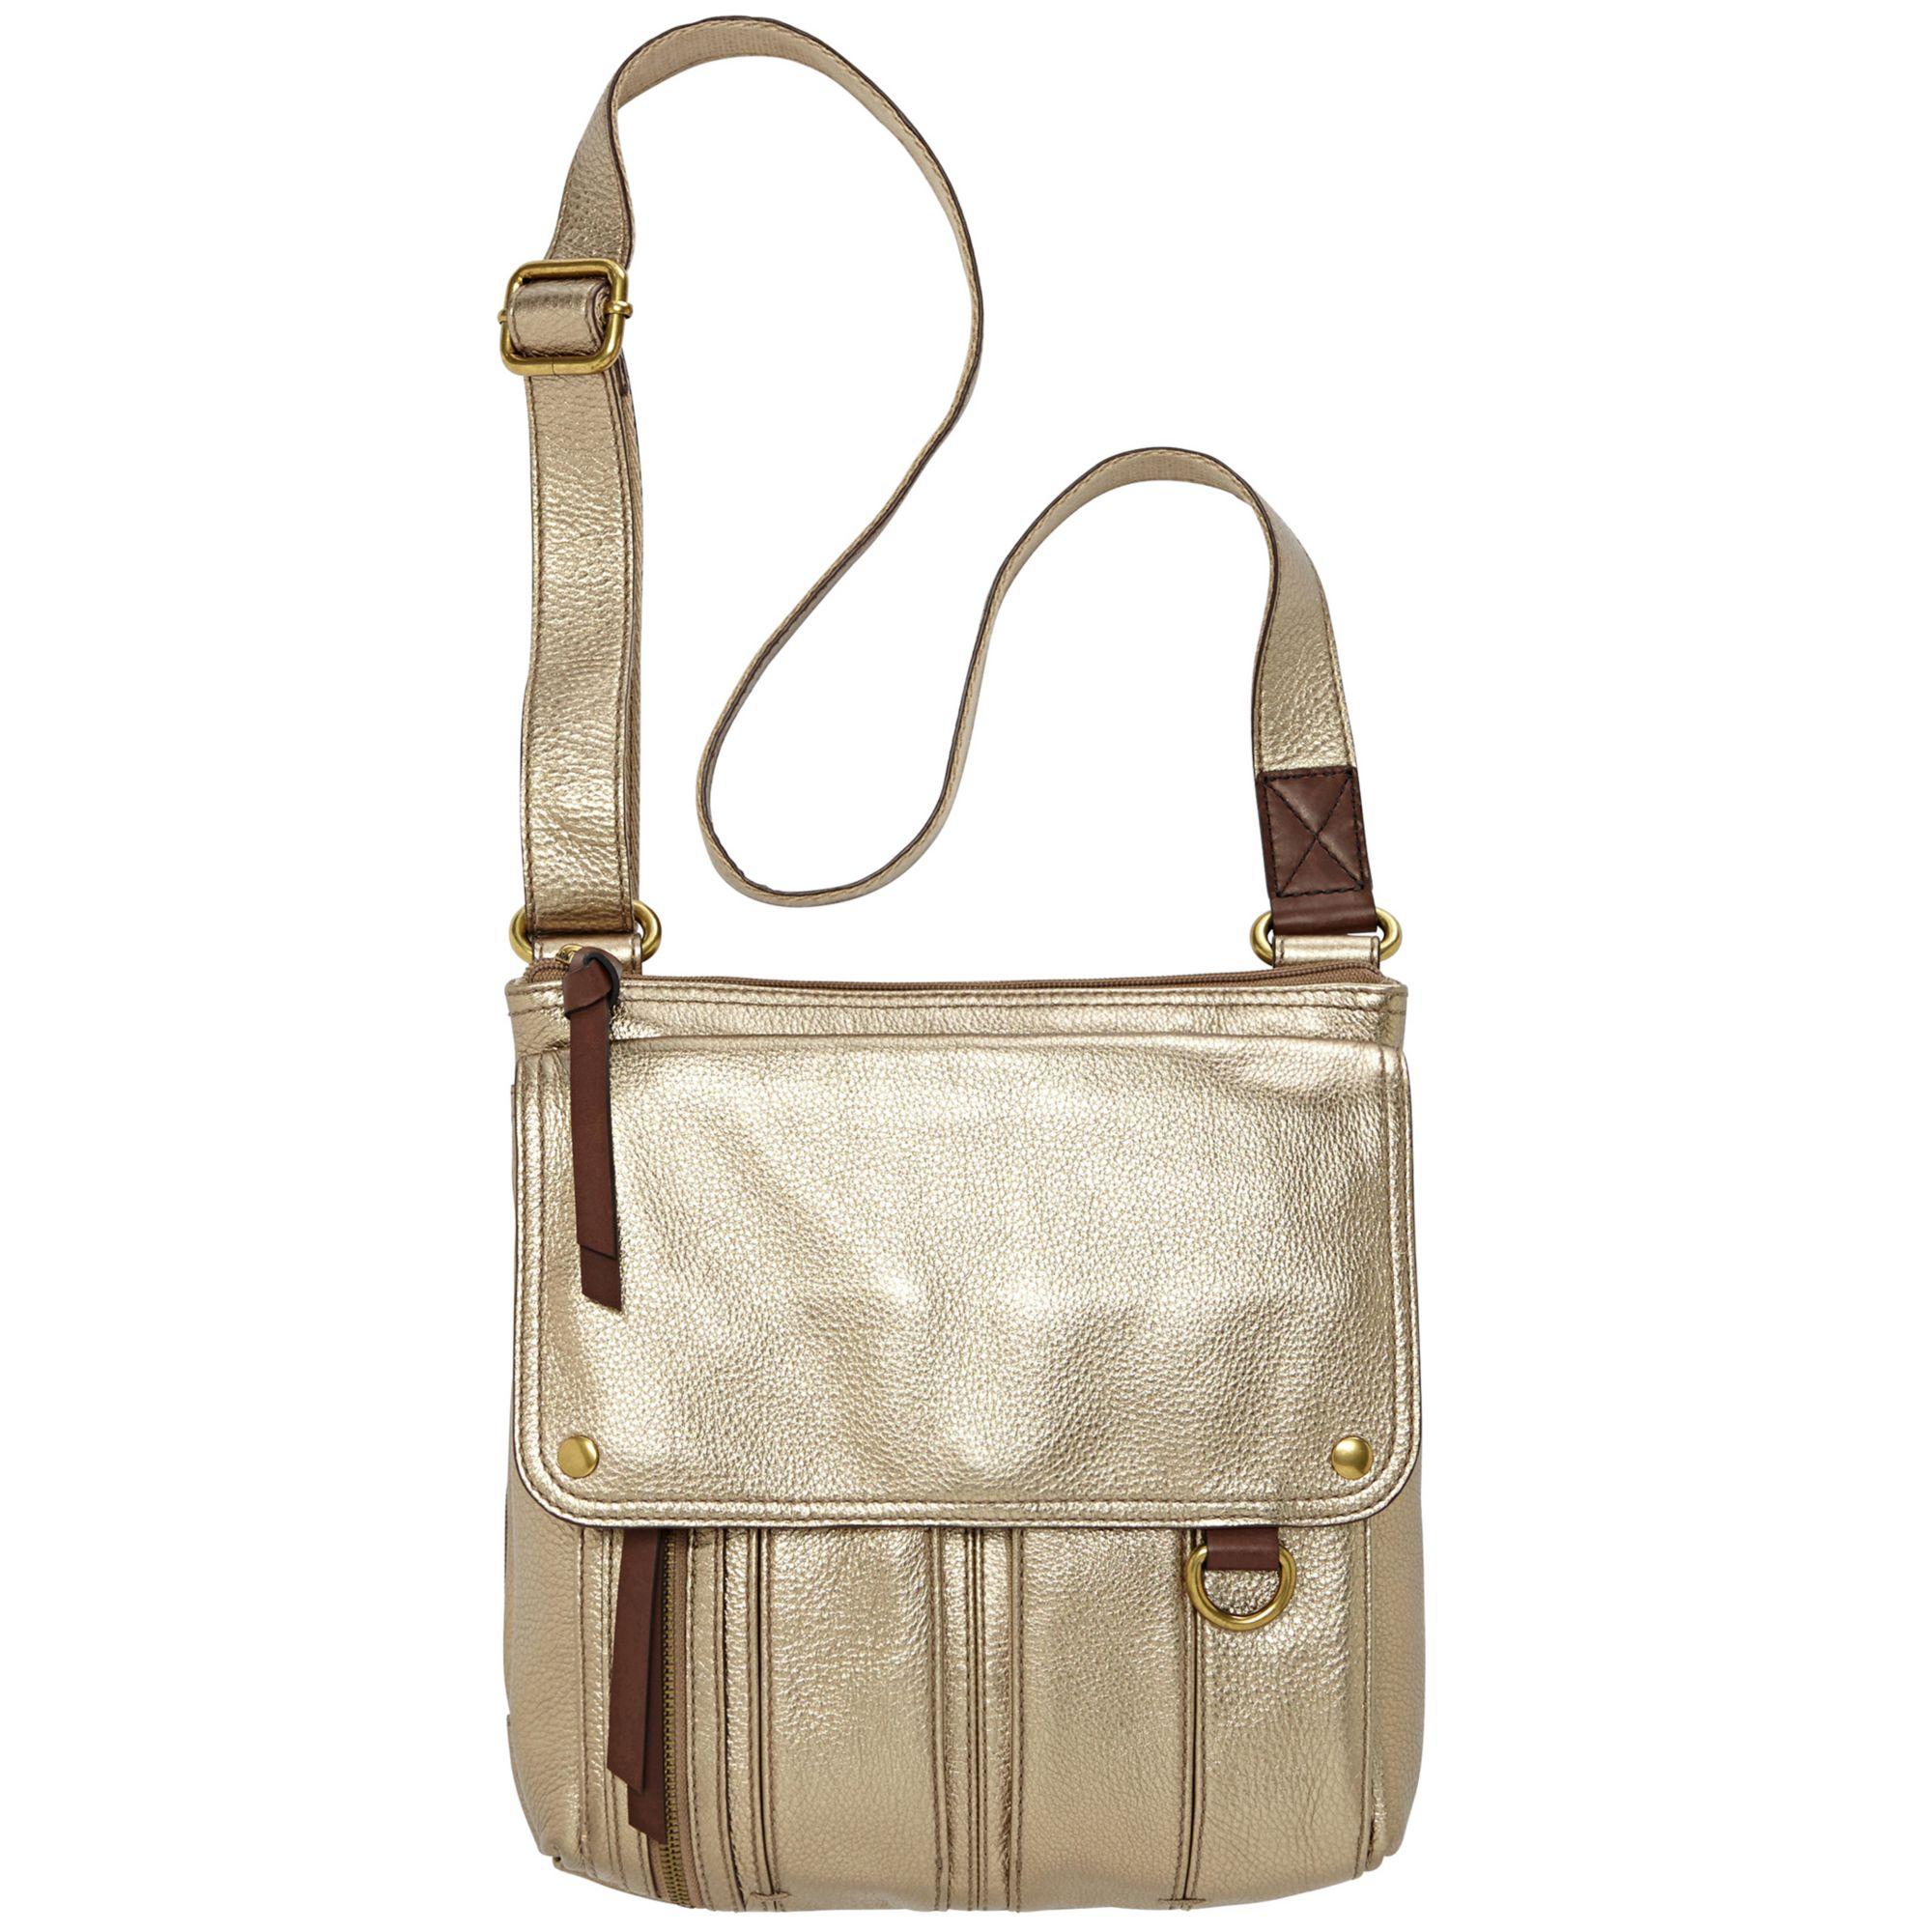 defe50017cd Fossil Morgan Leather Traveler Crossbody Bag in Metallic - Lyst